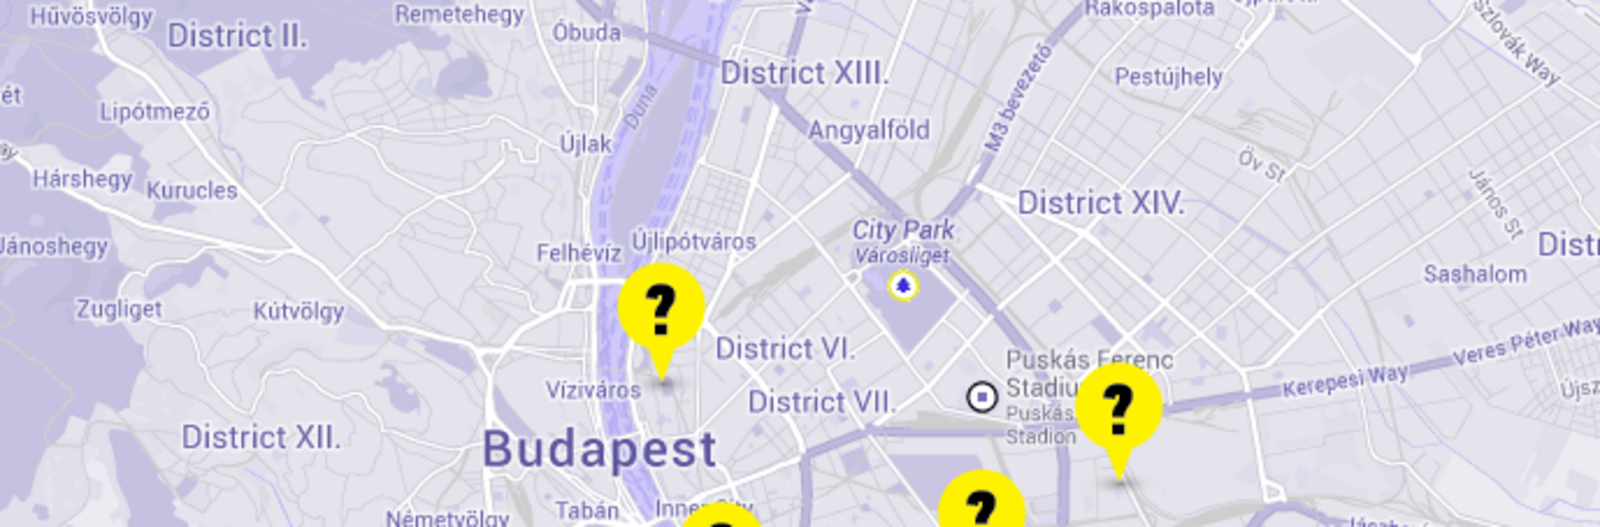 Rejtélyes budapesti Google Earth pontok